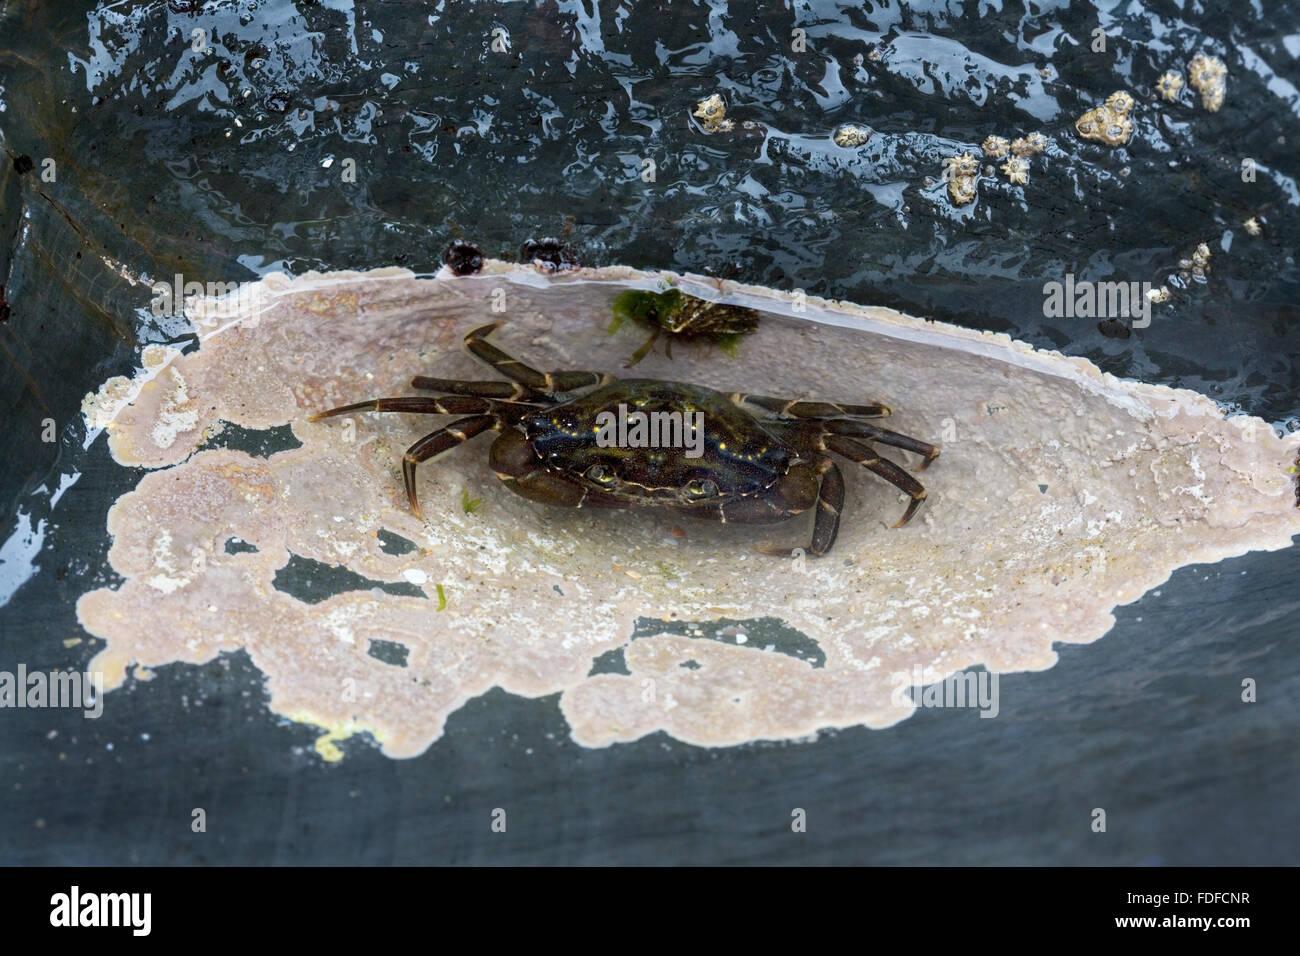 Green Shore Crab (Carcinus maenas) underwater, in rockpool, at Harlyn Bay, Cornwall, August 2009 - Stock Image